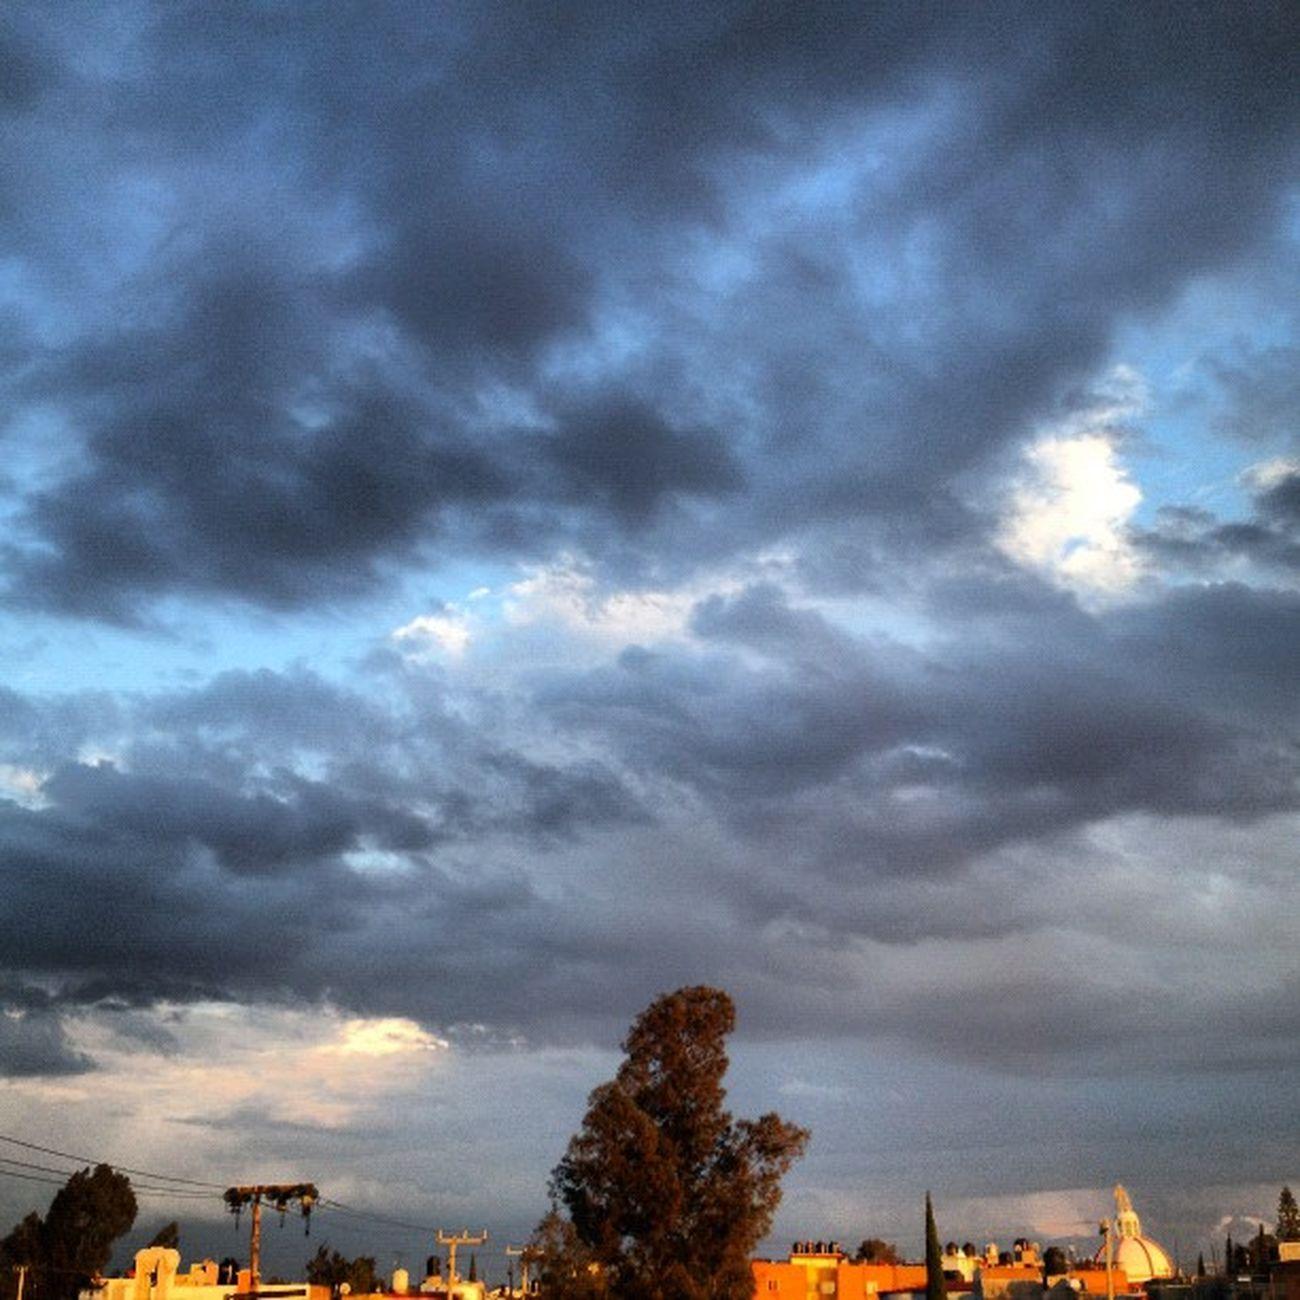 agua en el cielo #squaready #igers #igersdf #igersmx #igersme #proyectodf #sky #cloud #cloudporn #skyporn #travel #traveler Sky Travel Cloud Cloudporn Skyporn Traveler Igers Squaready Igersme Igersdf Proyectodf Igersmx Elcielo